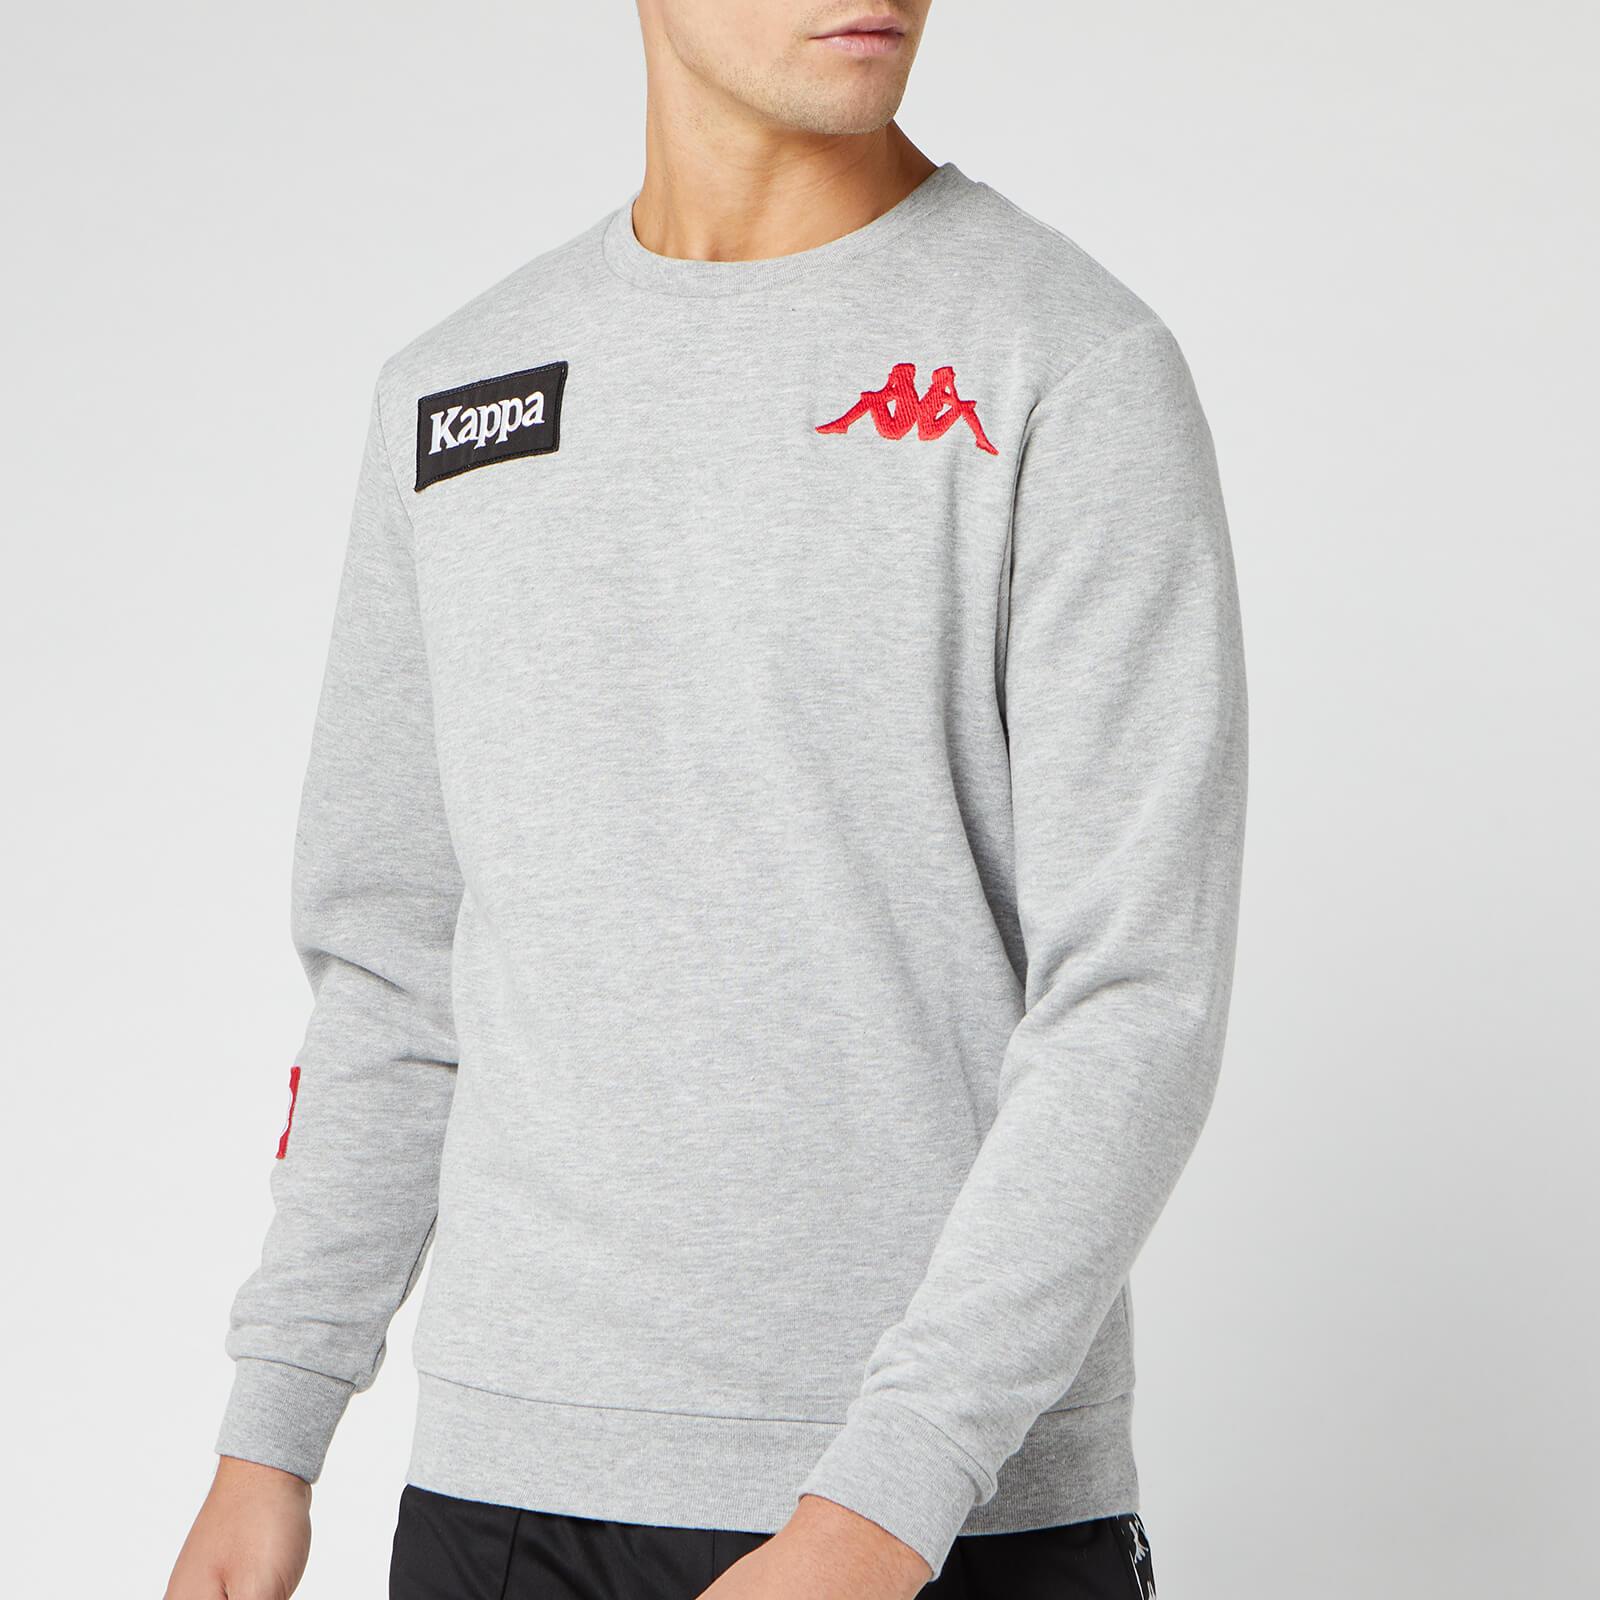 Kappa Men's Authentic La Bayza USA Sweatshirt - Grey Melange - S